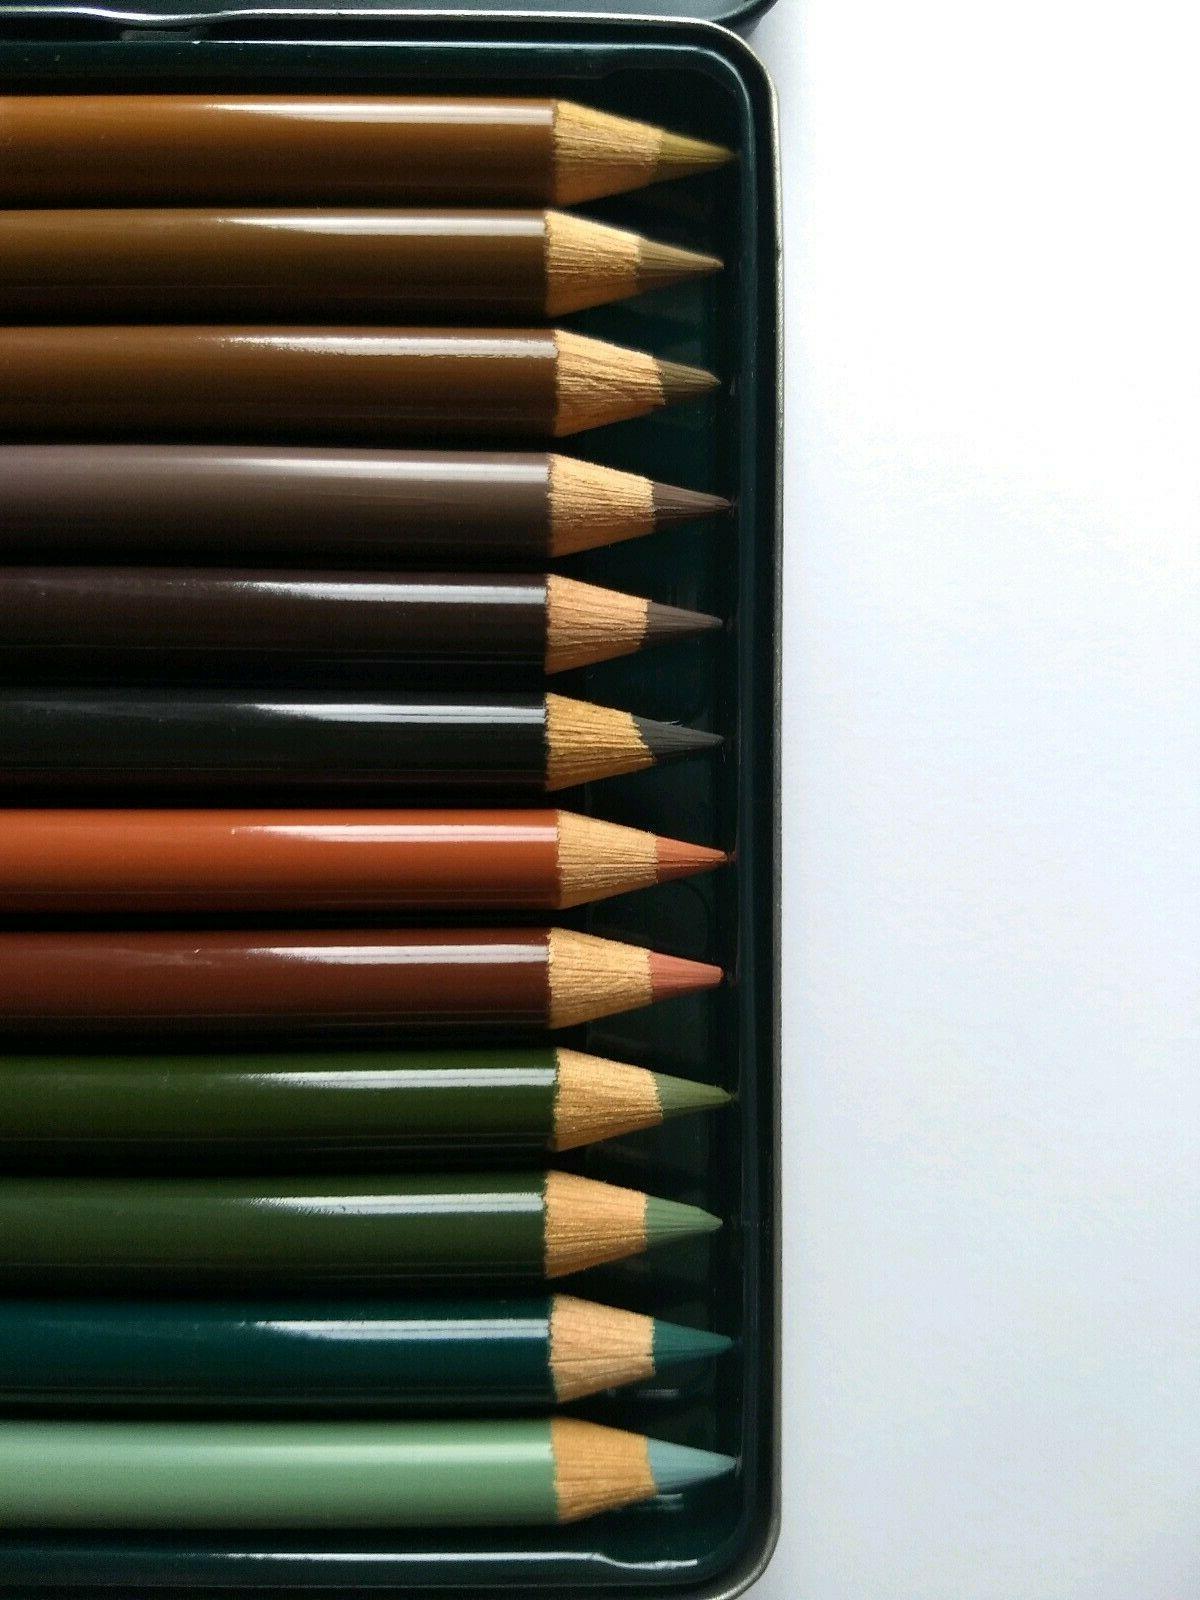 Faber Castell 12 Artist Color Pencils - Nature NOS